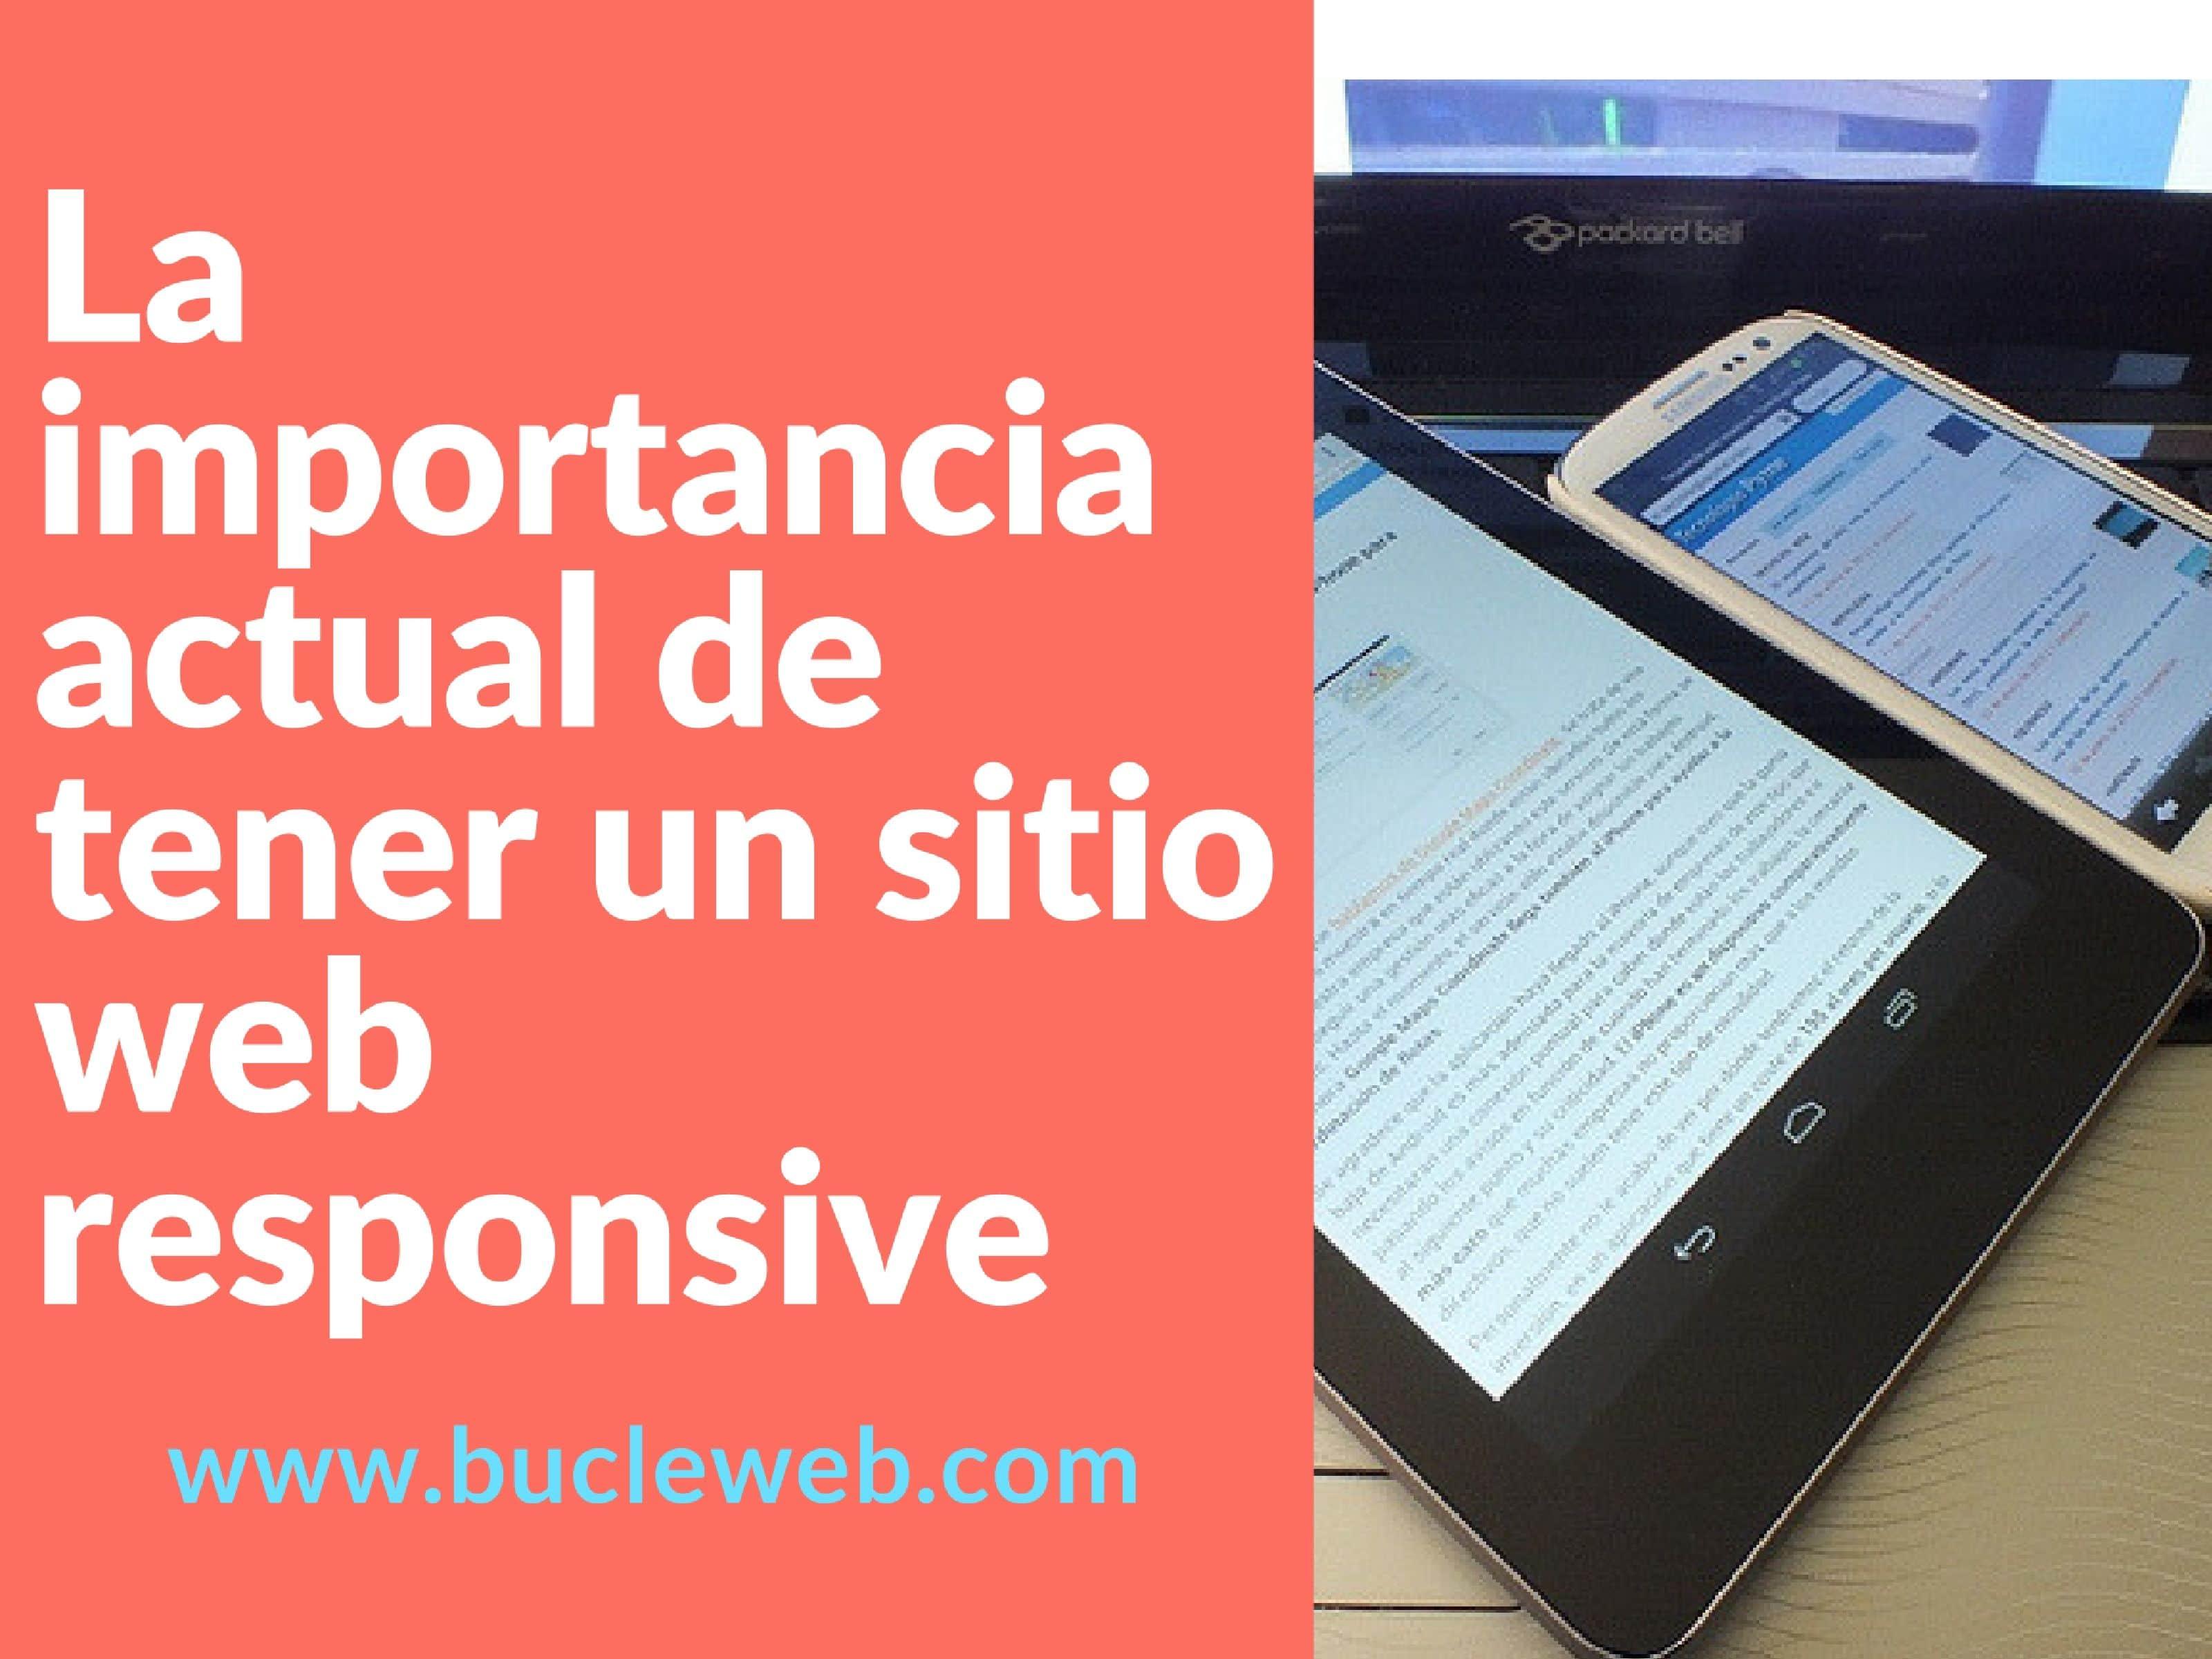 sitio web responsive